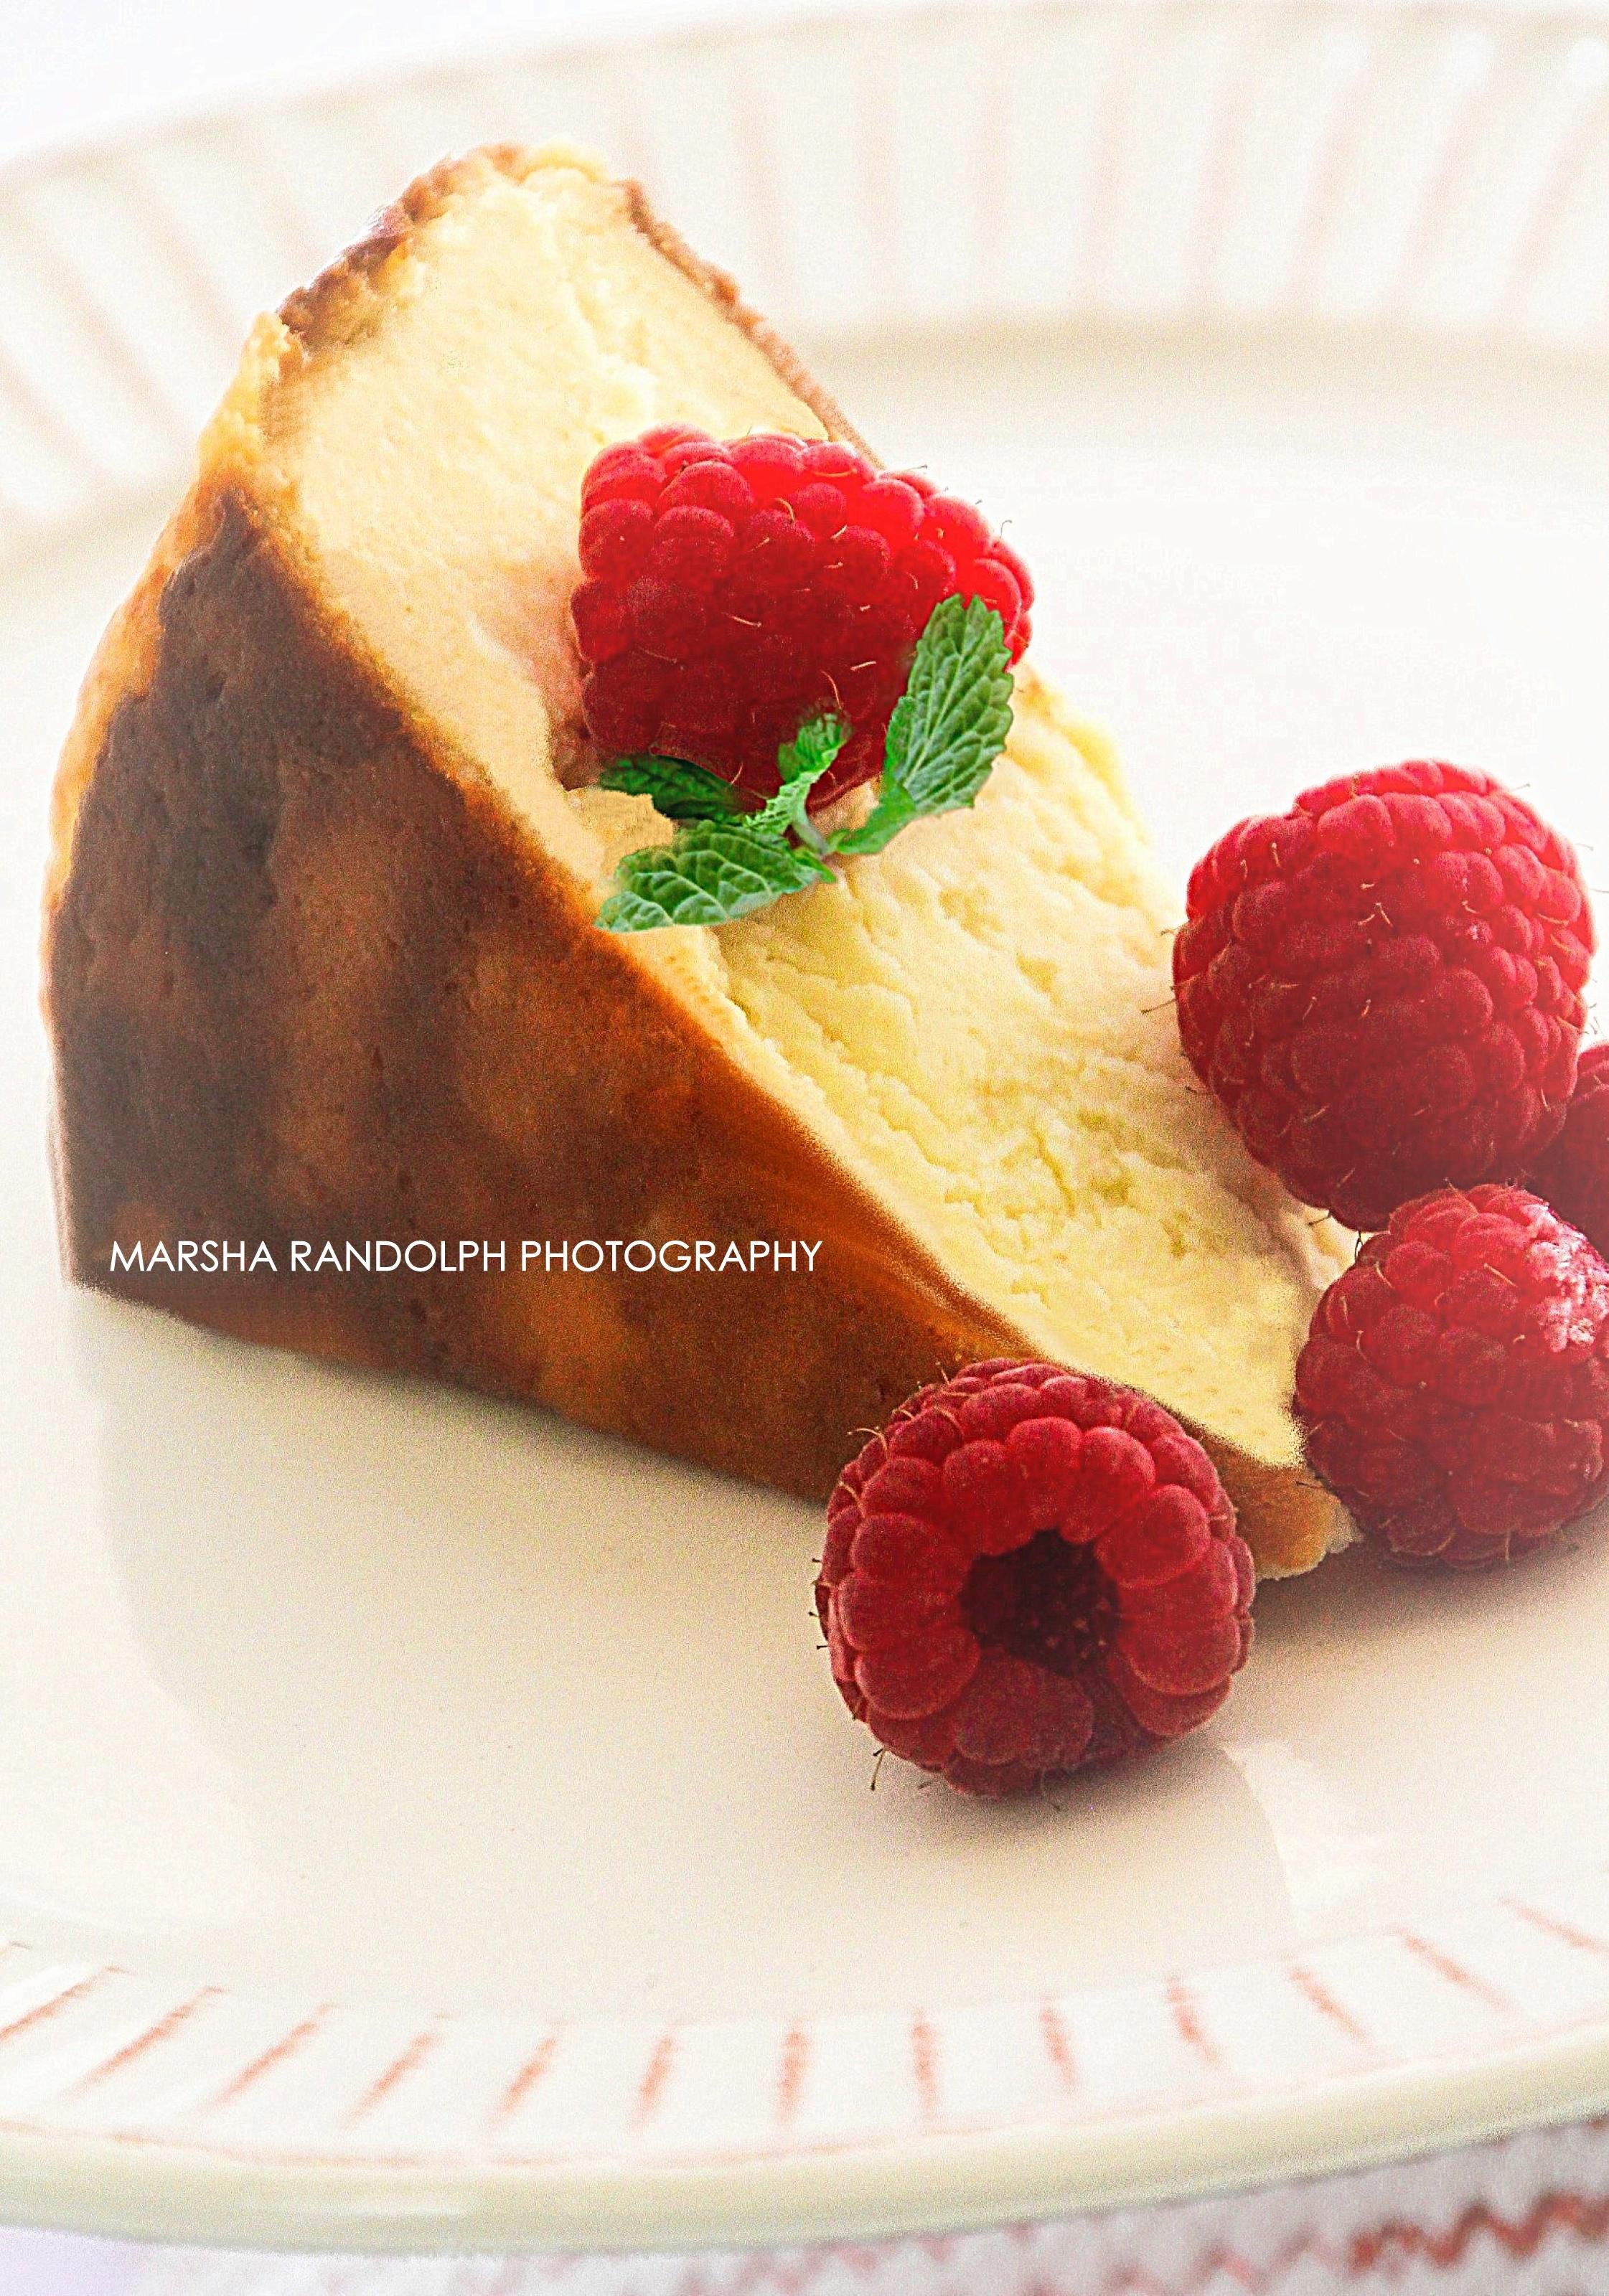 FOOD_CHEESE_CAKE RASBERRIES_MINT_VIGNETT